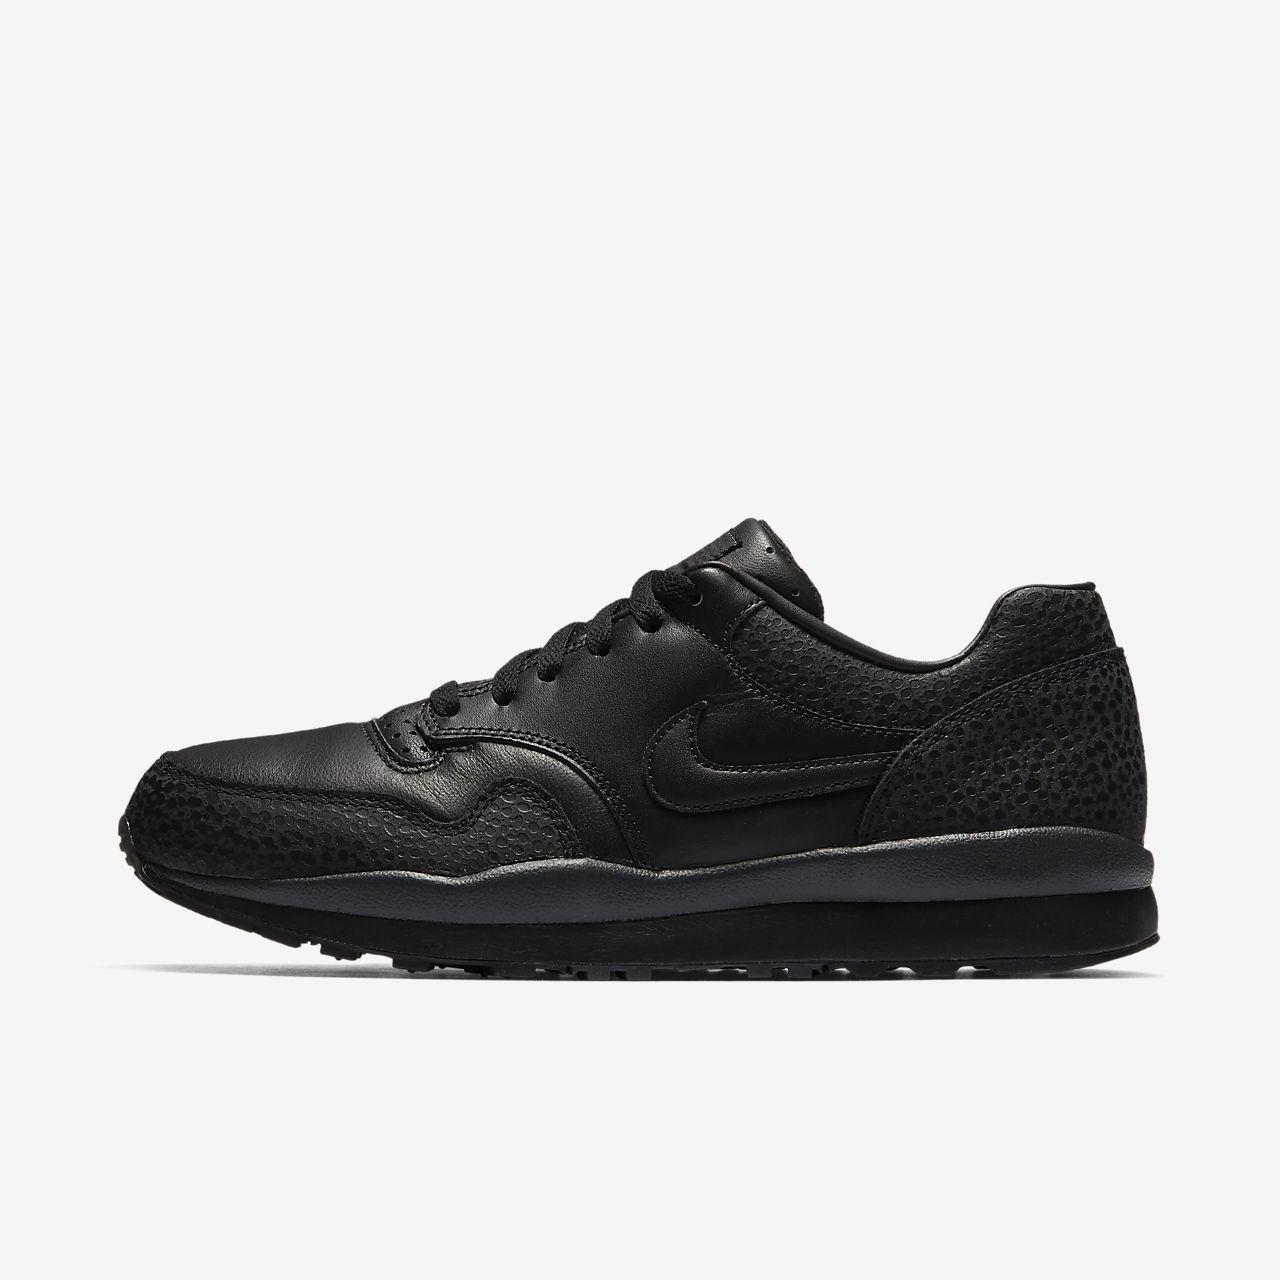 pretty nice b0a23 04666 Buty męskie Nike Air Safari QS